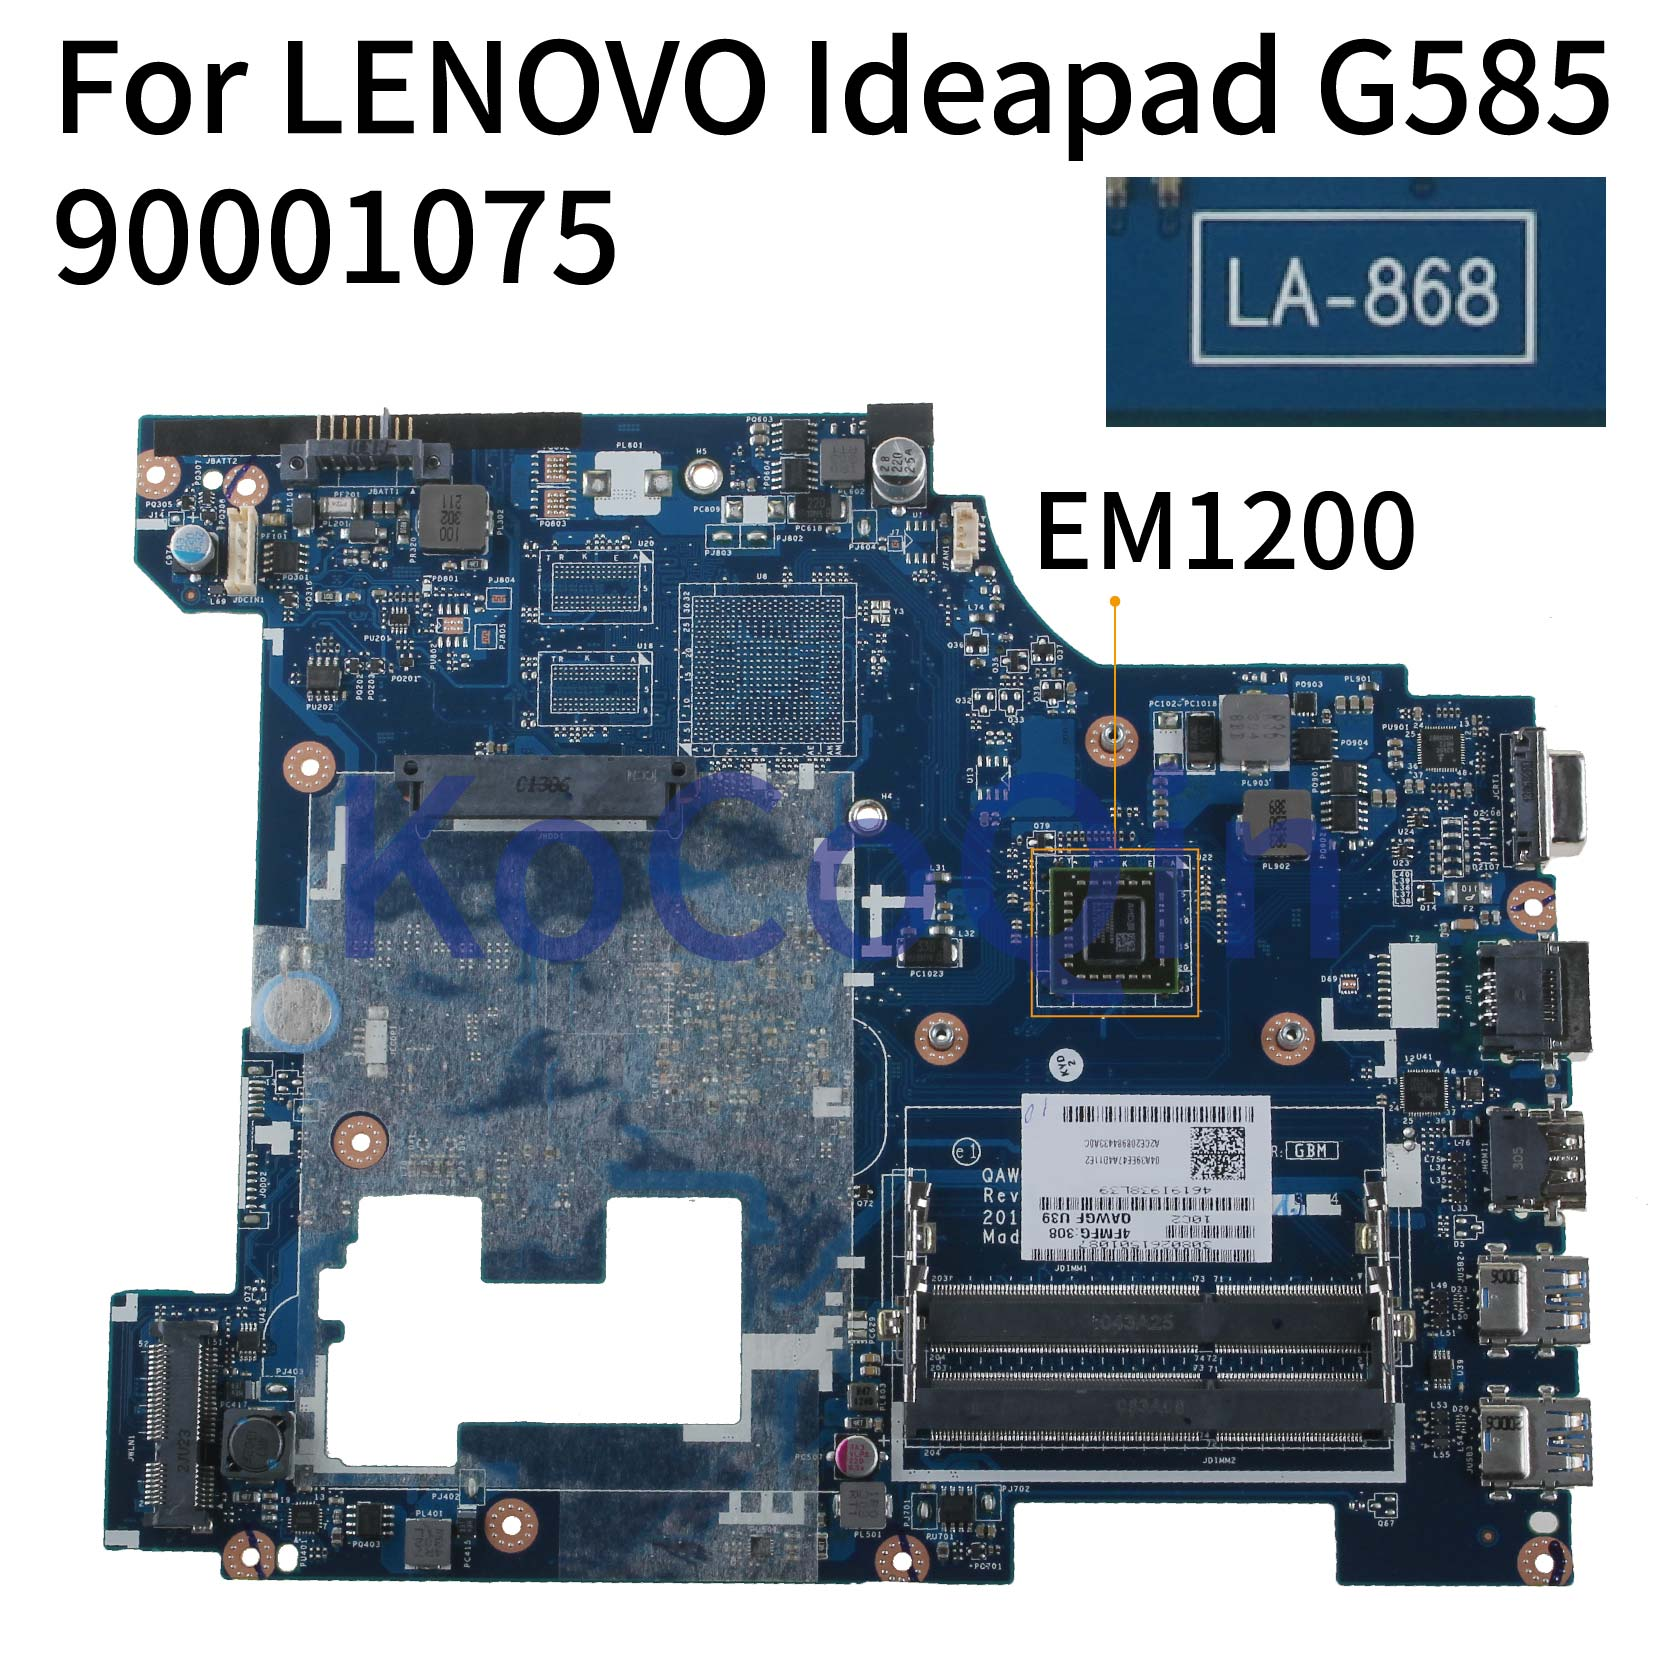 KoCoQin Laptop Motherboard For LENOVO Ideapad G585 15.6' Inch Mainboard LA-8681P 90001075 EM1200